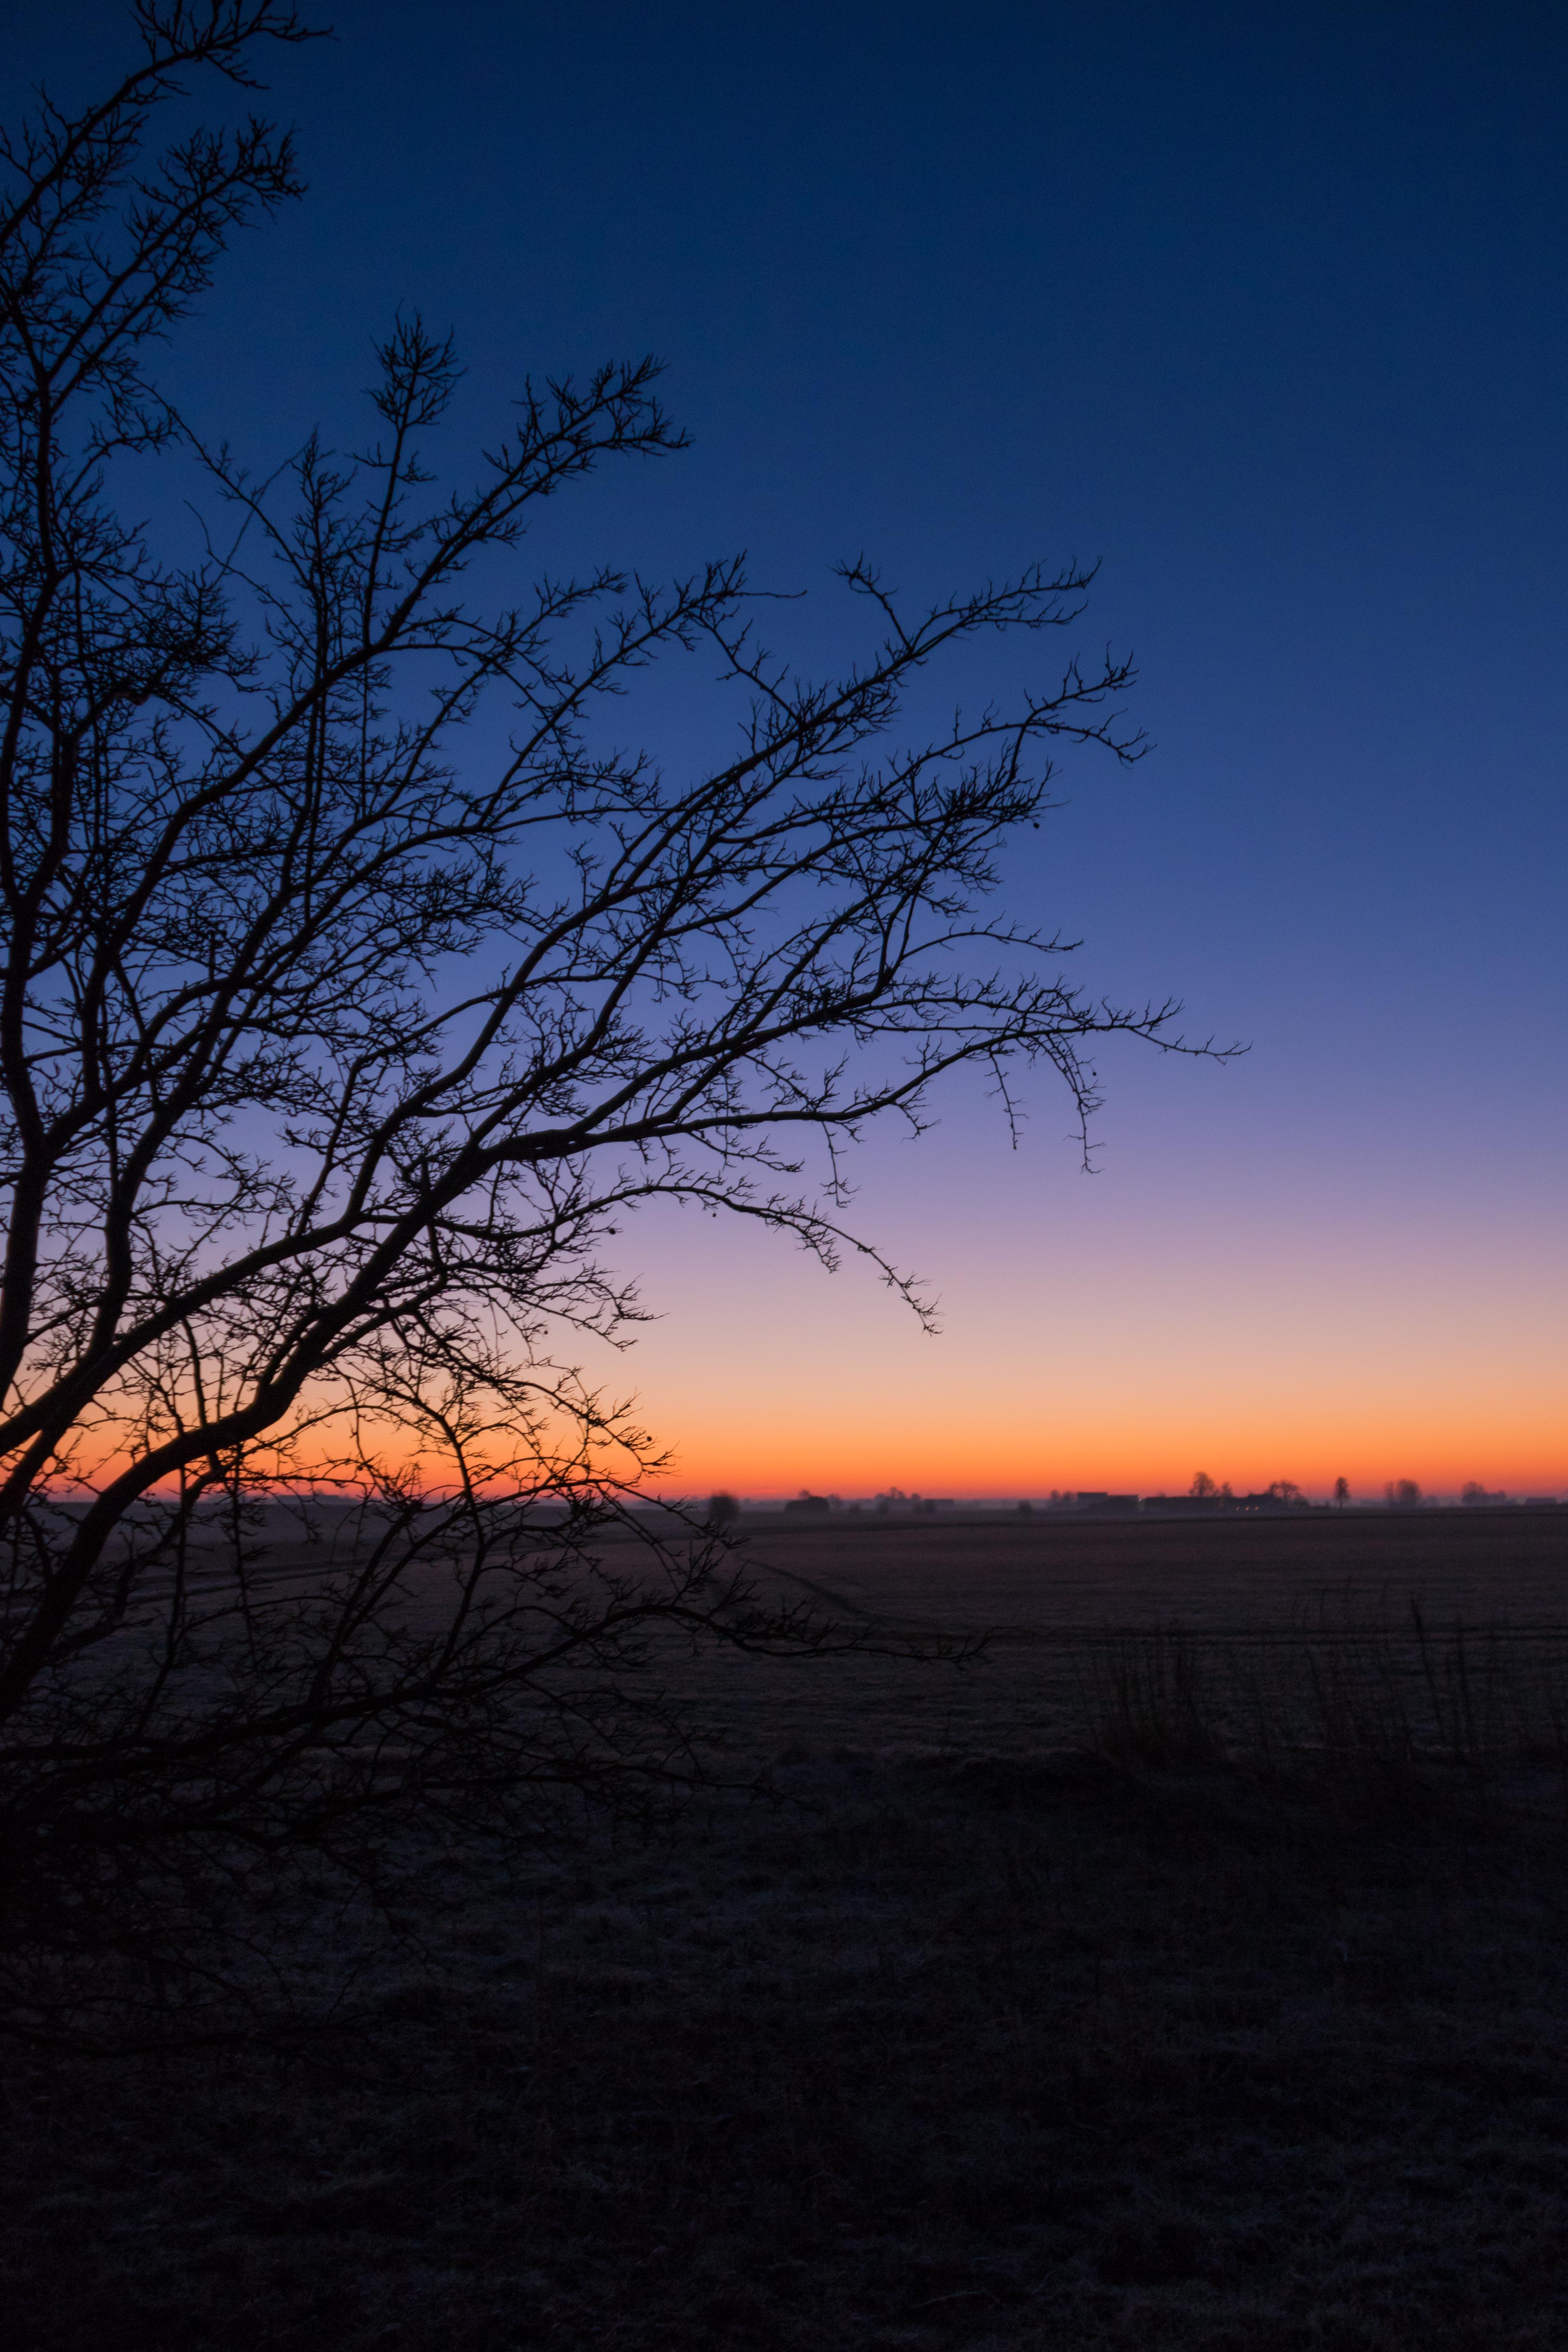 Wallpaper Sunlight Landscape Sunset Nature Sky Branch